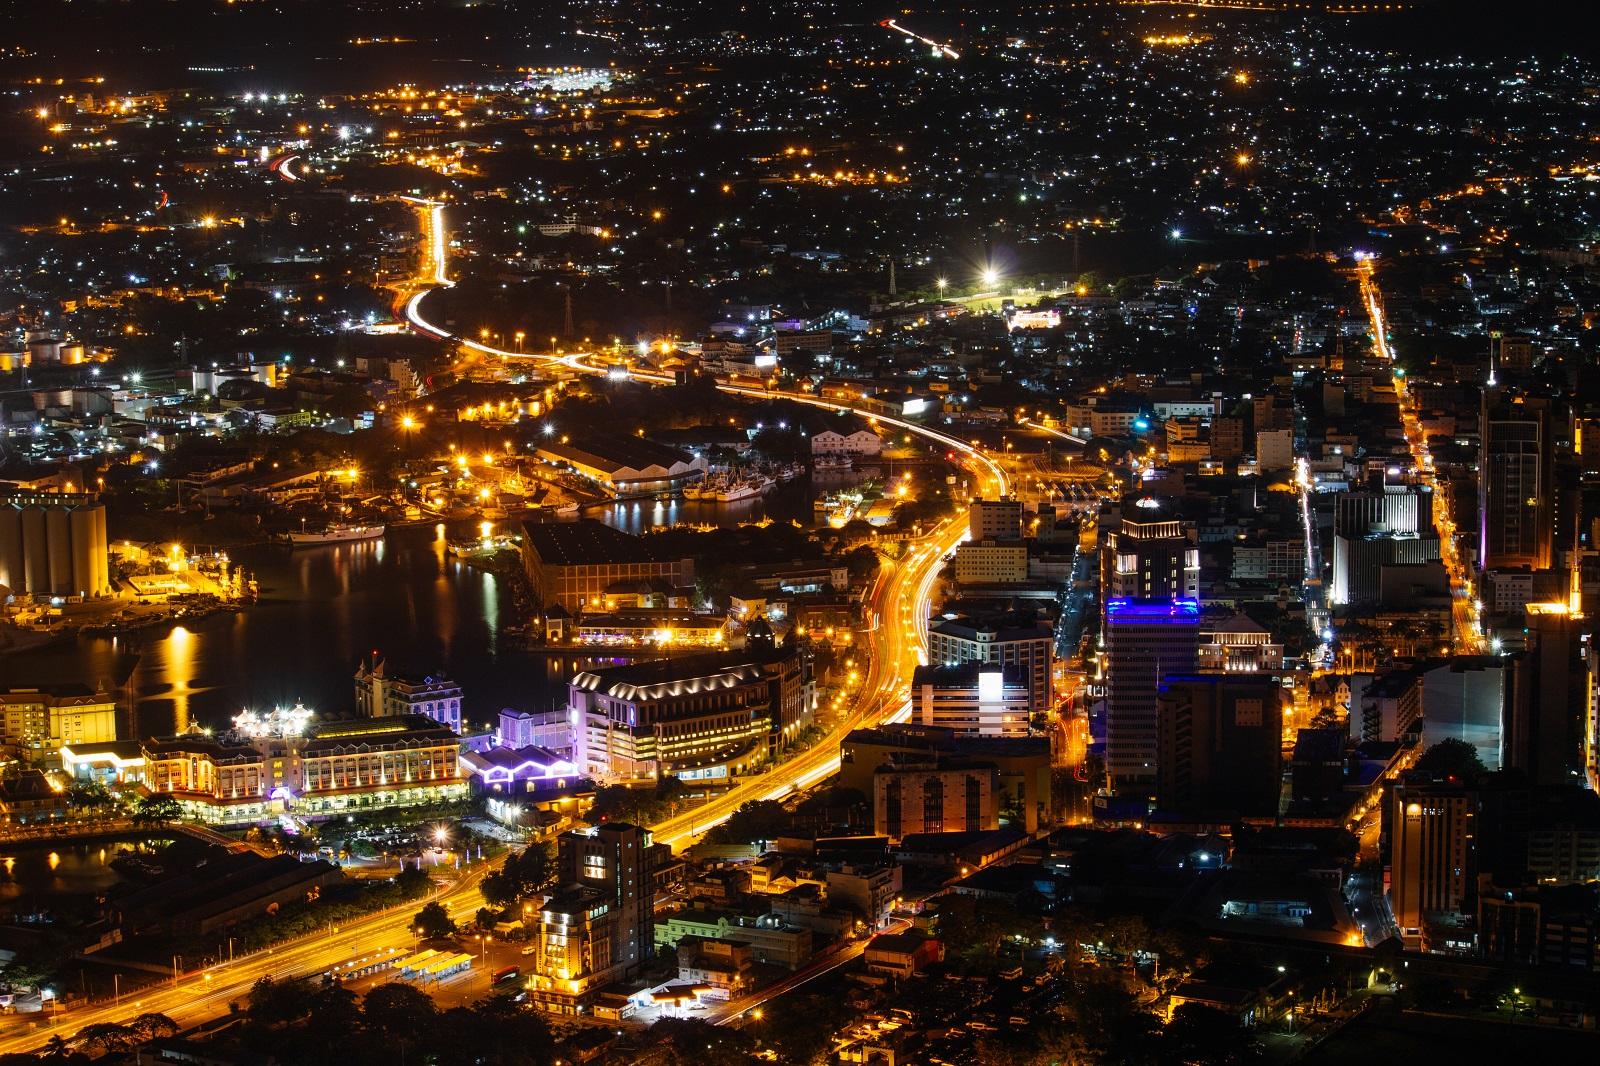 Port_Louis_Mauritius_at_night (1)